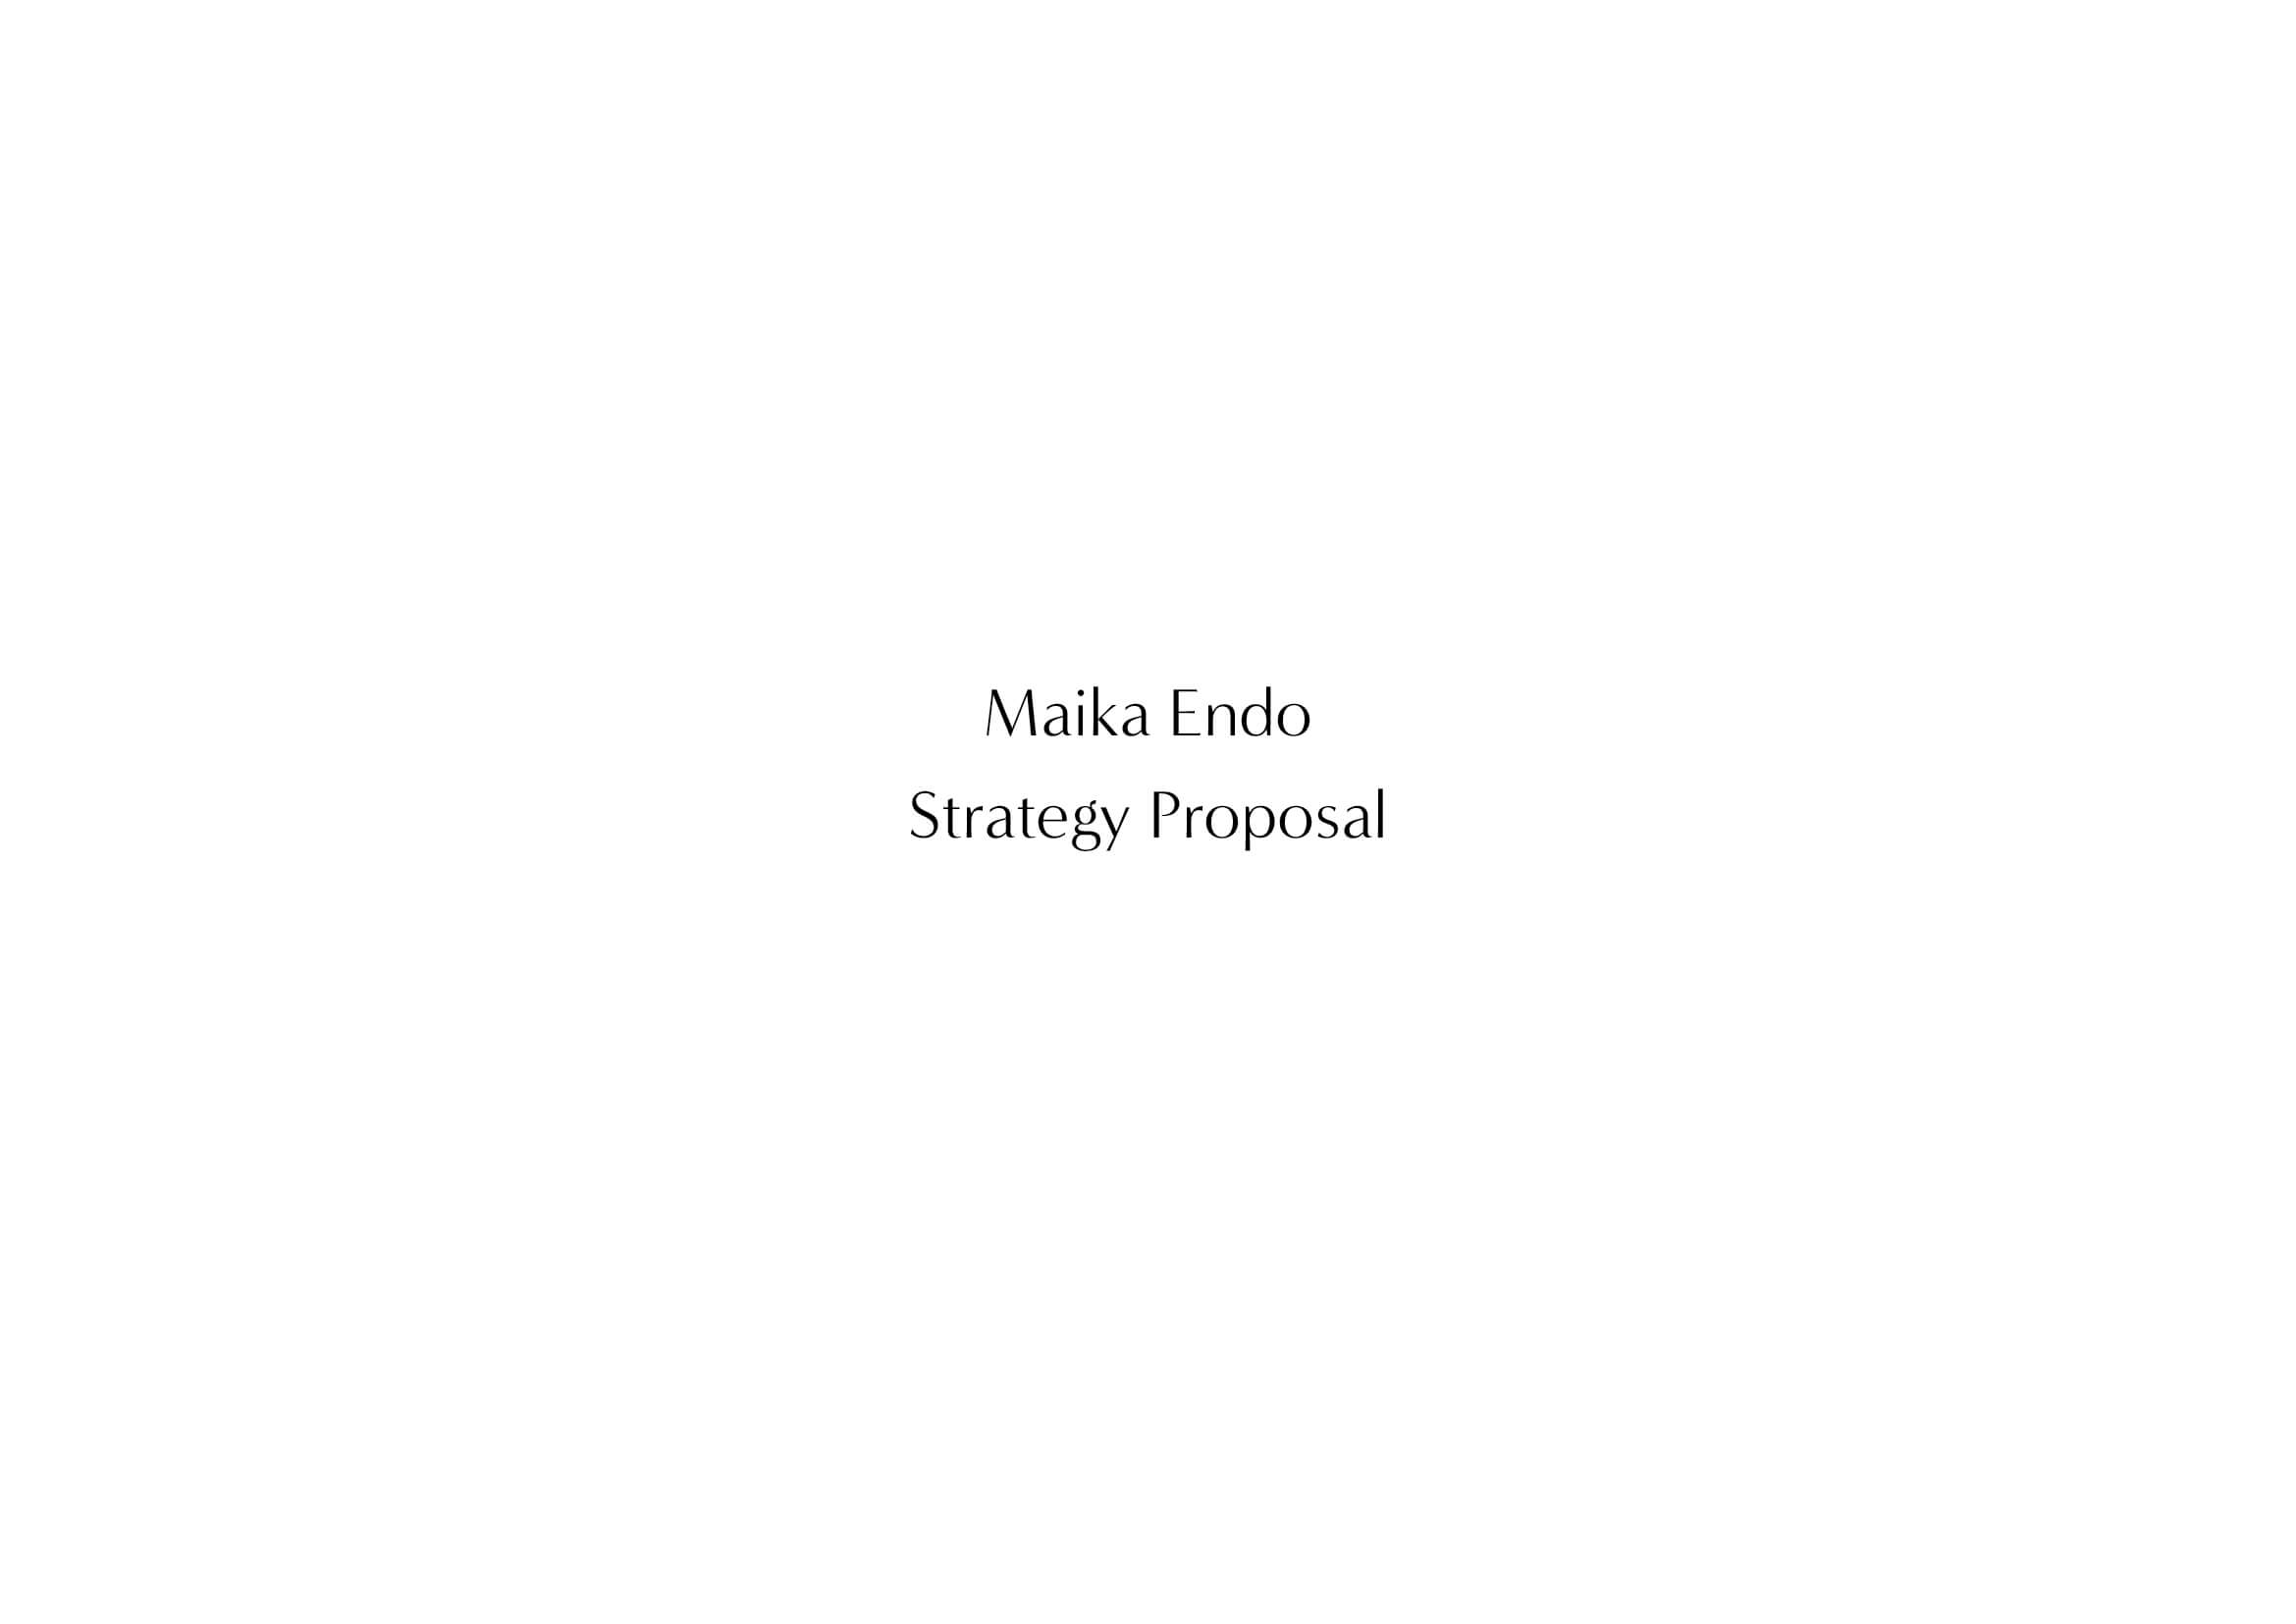 Maika Endo Strategy Proposal.jpg